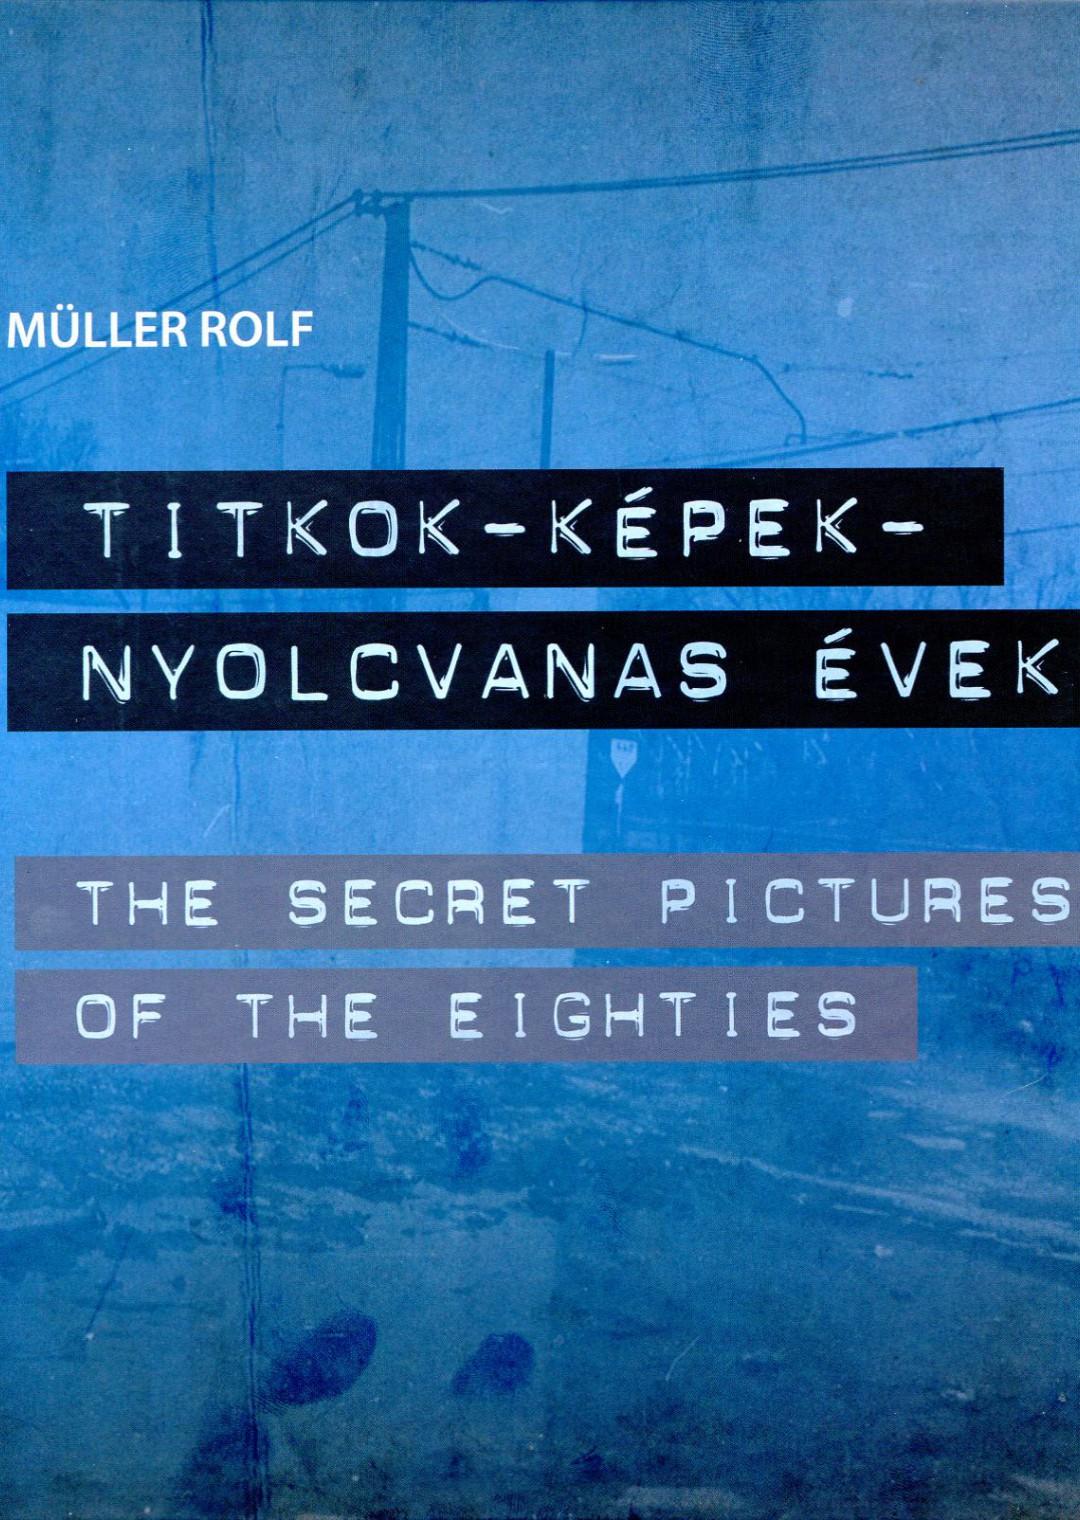 TITKOK – KÉPEK – NYOLCVANAS ÉVEK / The Secret Pictures of the Eighties